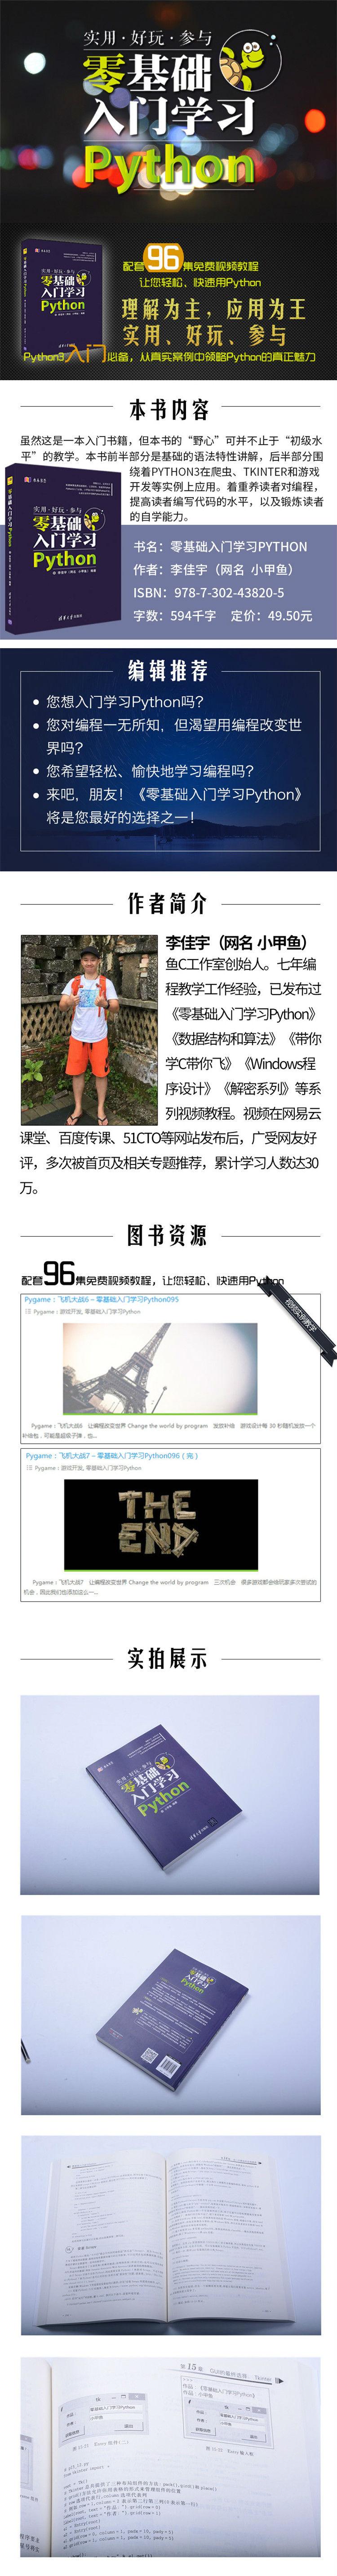 《Python零基础入门学习-水木书荟 pdf 百度云免费下载》